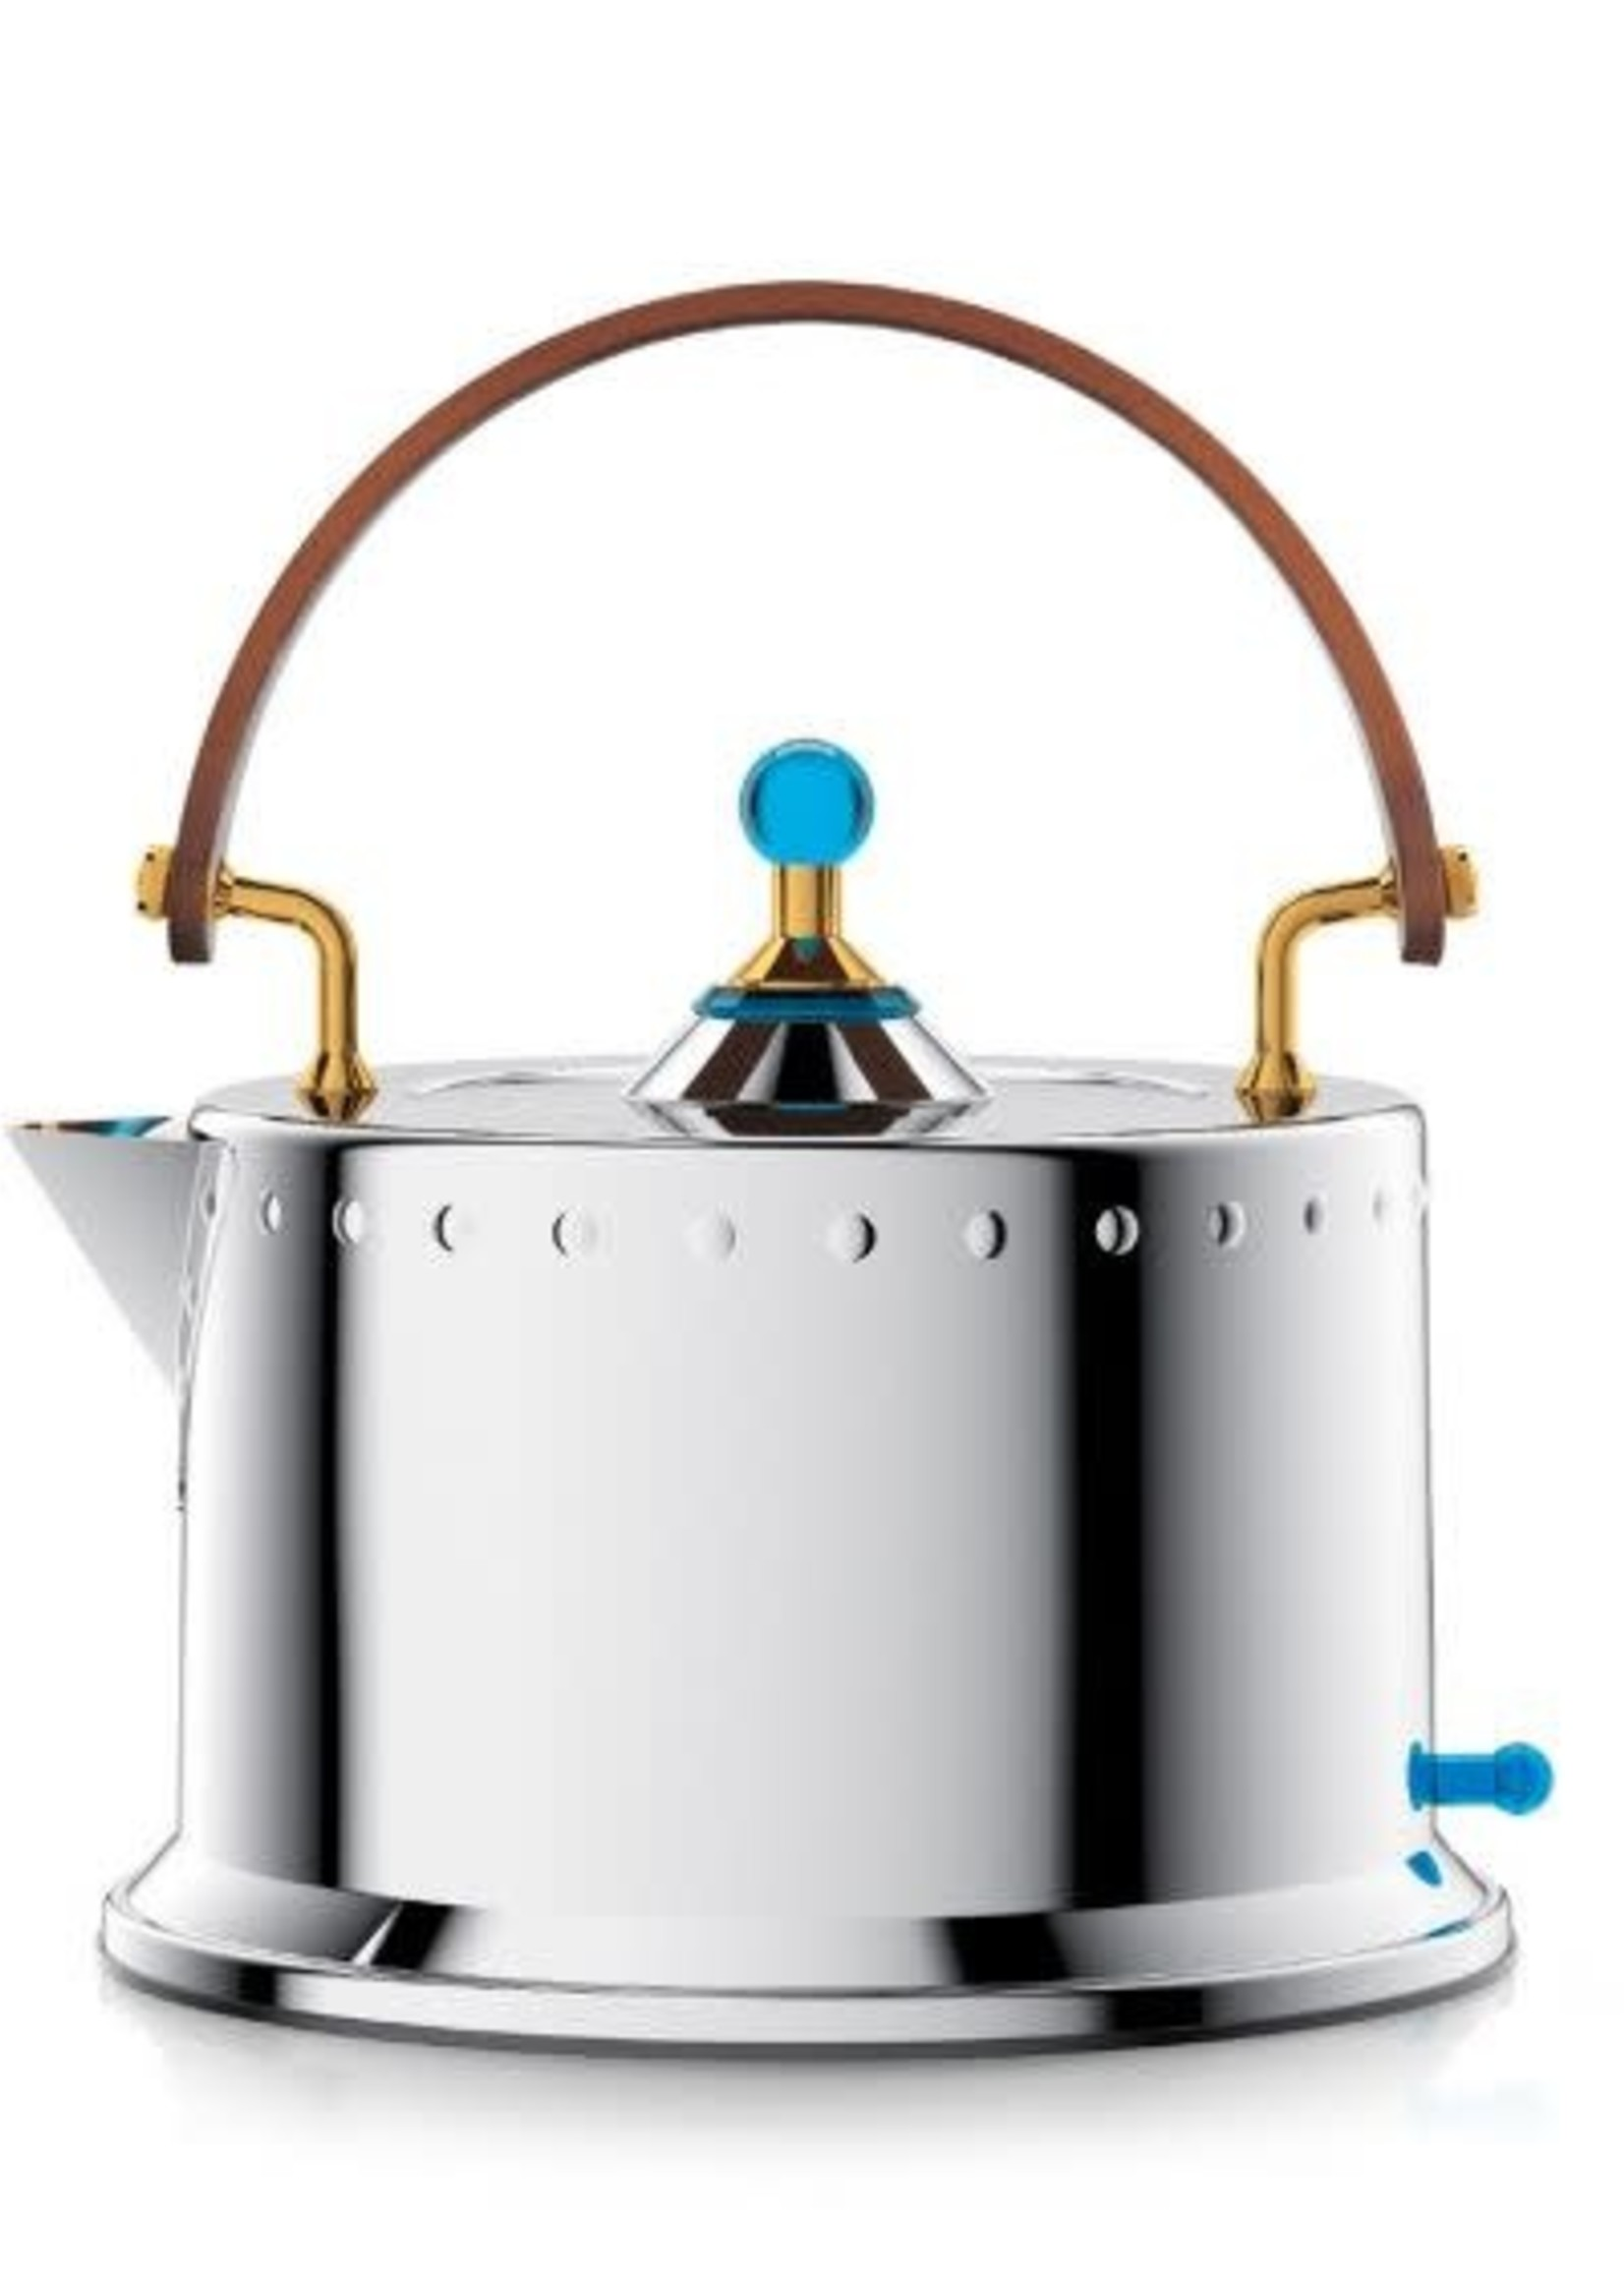 Bodum Bodum OTTONI Electric Kettle